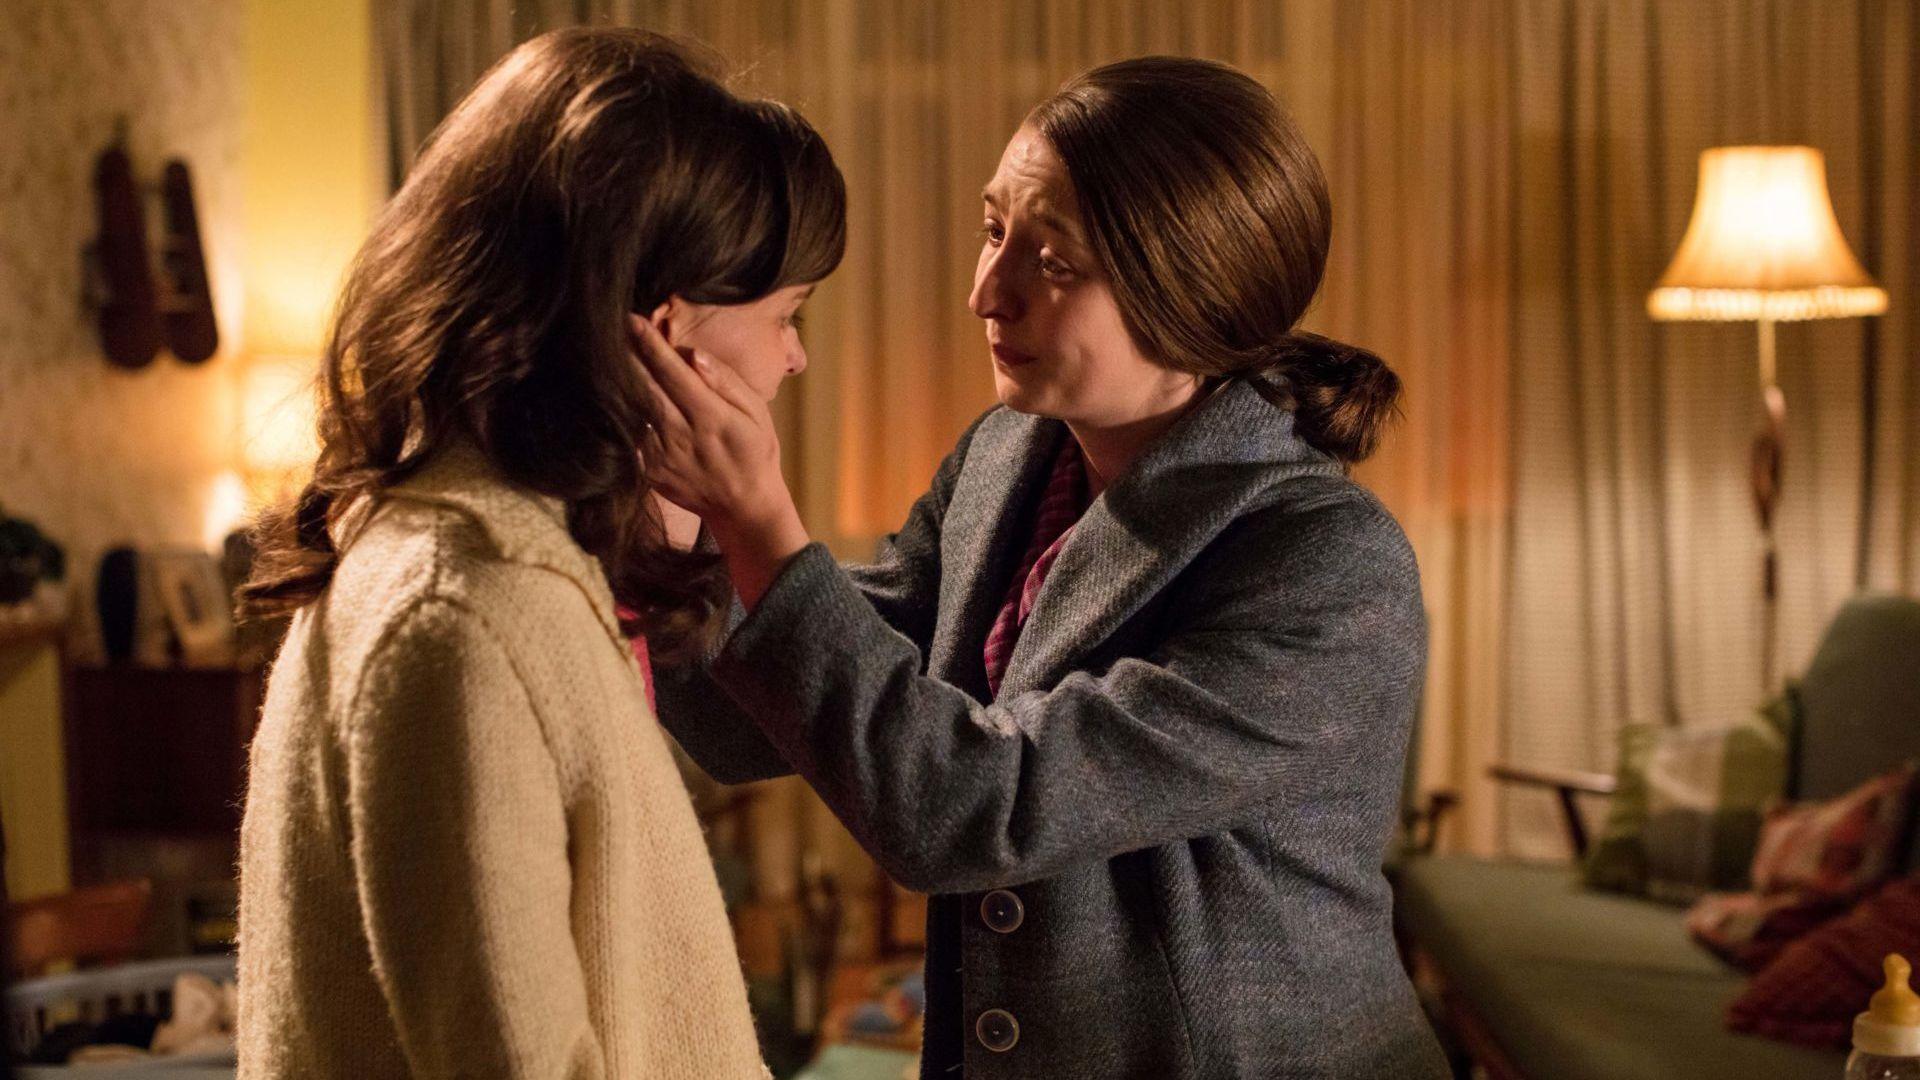 Cath Hindman (EMILY BARBER) shares her secret with her sister Lesley Whyte (JORDON STEVENS).